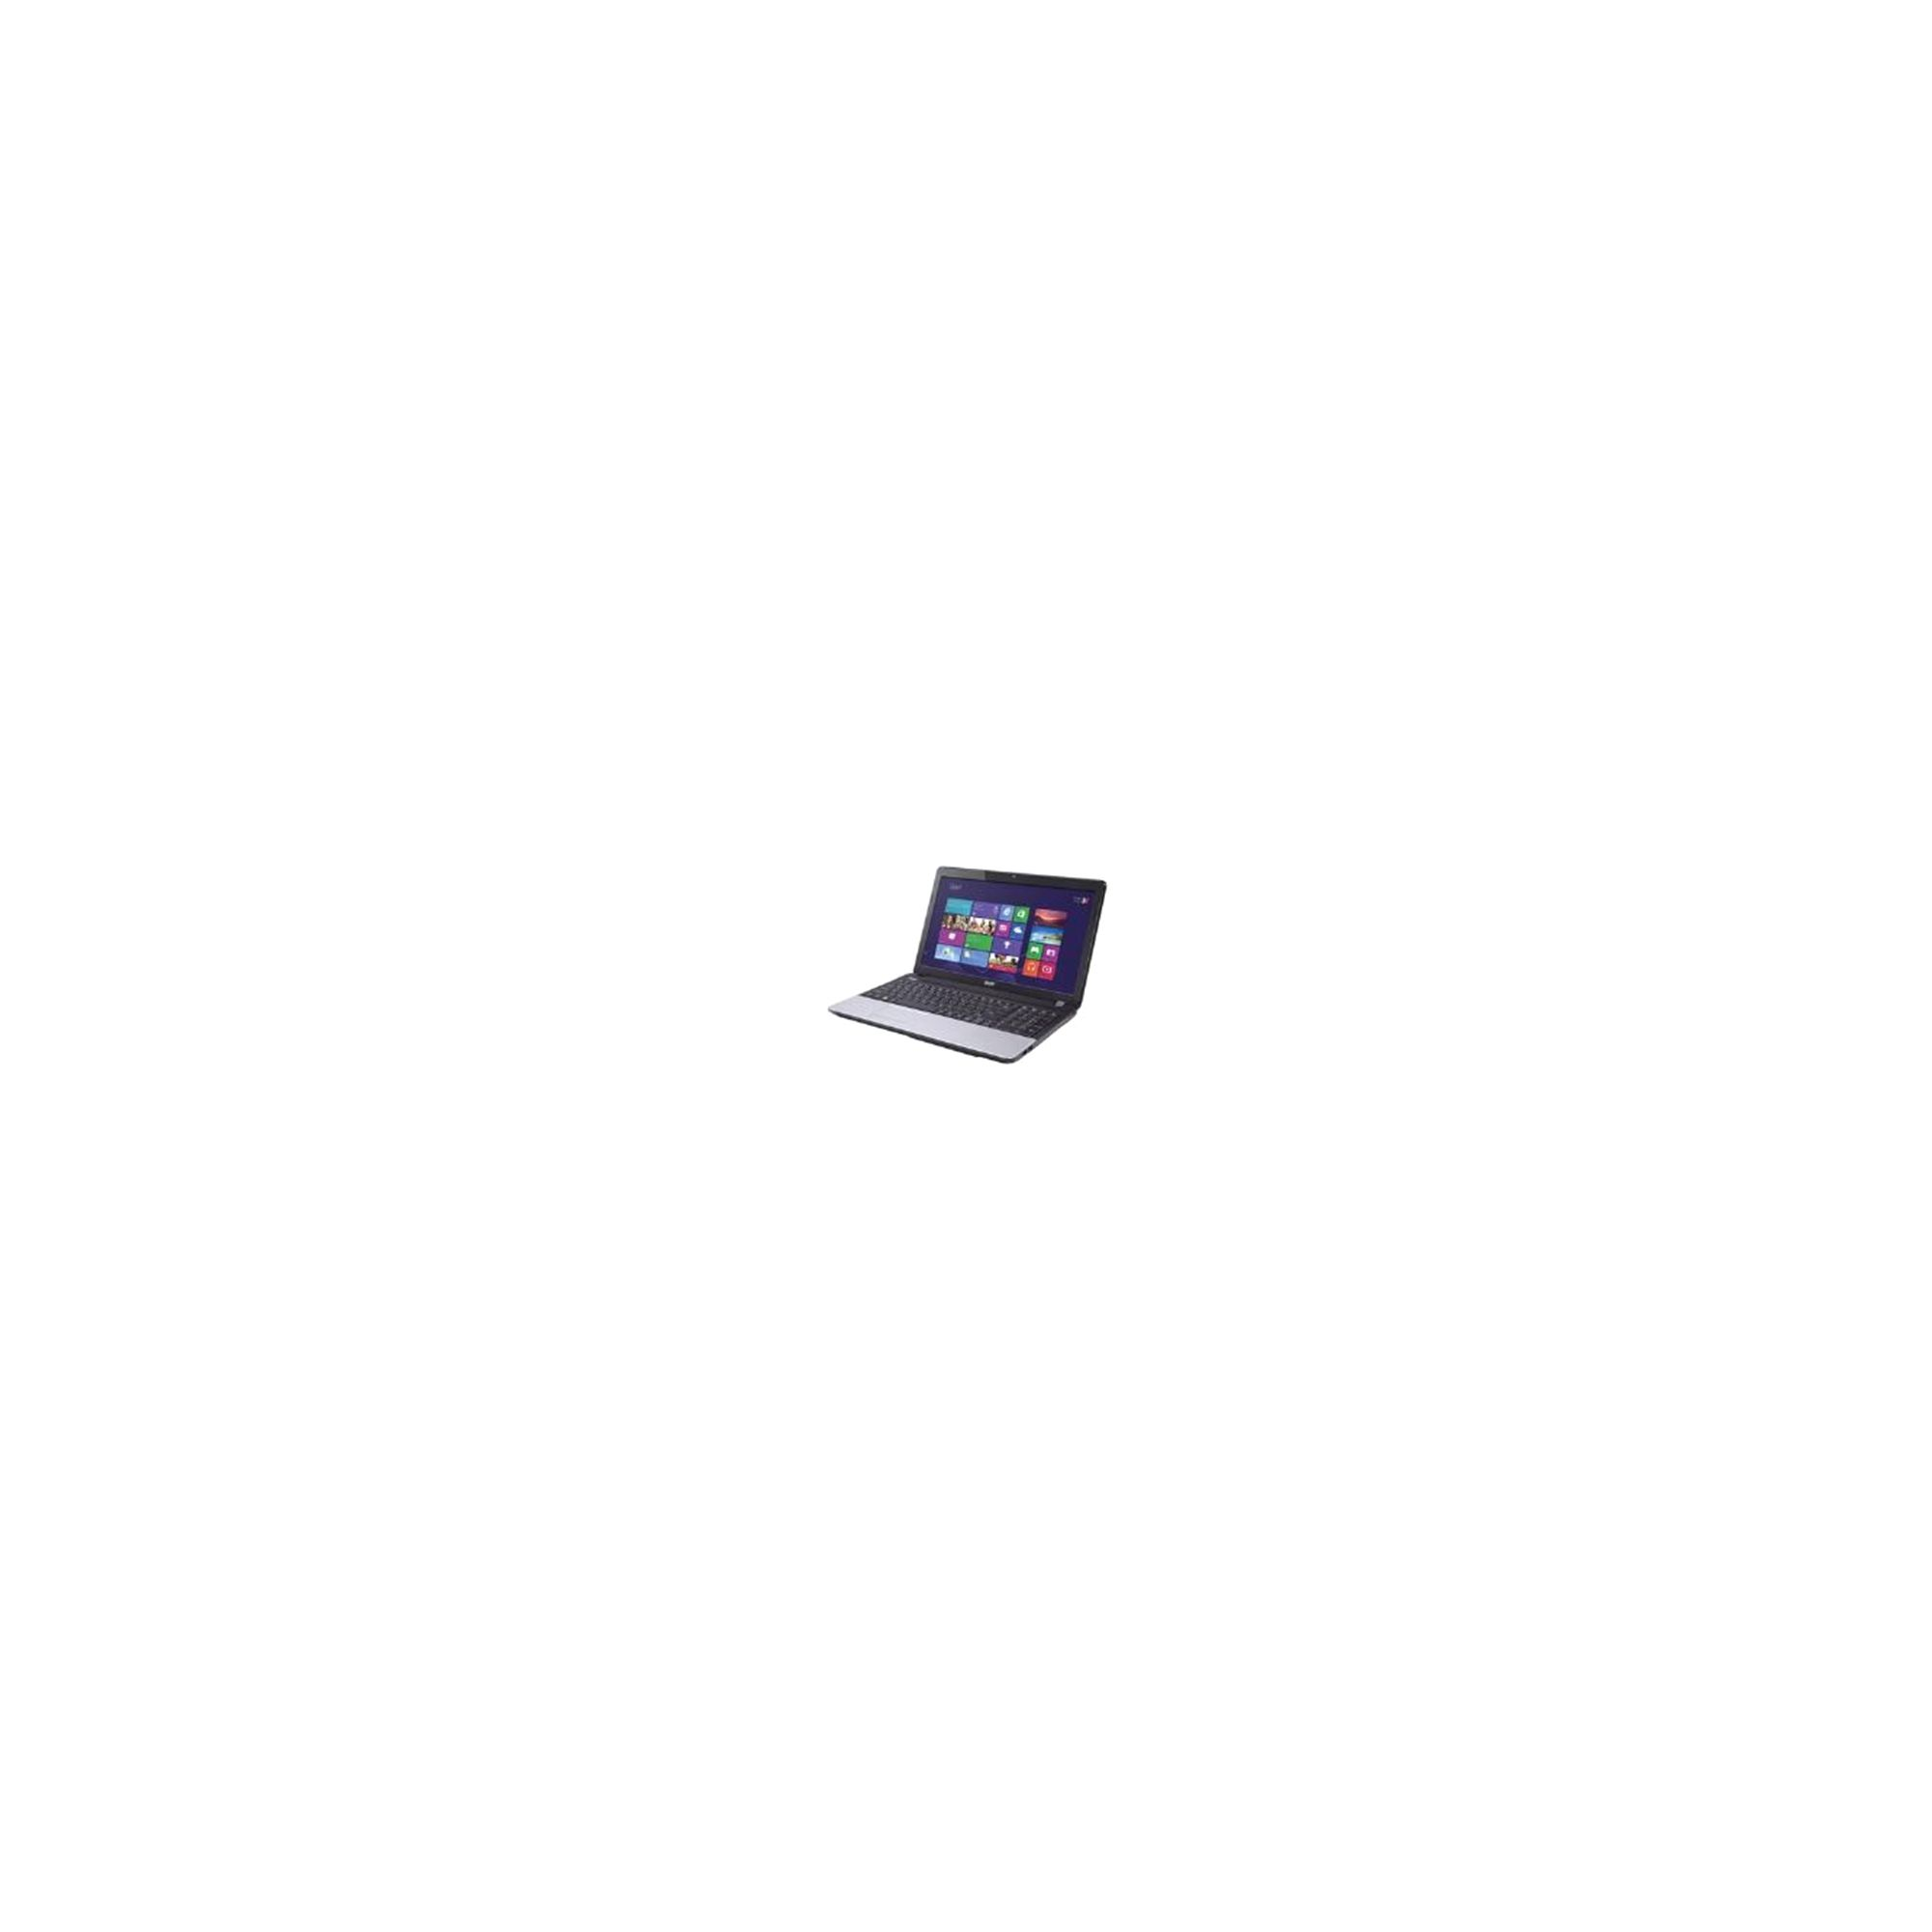 Acer TravelMate P253-M-33114G50Mnks (15.6 inch) Notebook Core i3 (3110M) 2.4GHz 4GB 500GB DVD-SuperMulti DL WLAN Webcam Windows 7 Pro 64-bit/Windows at Tesco Direct